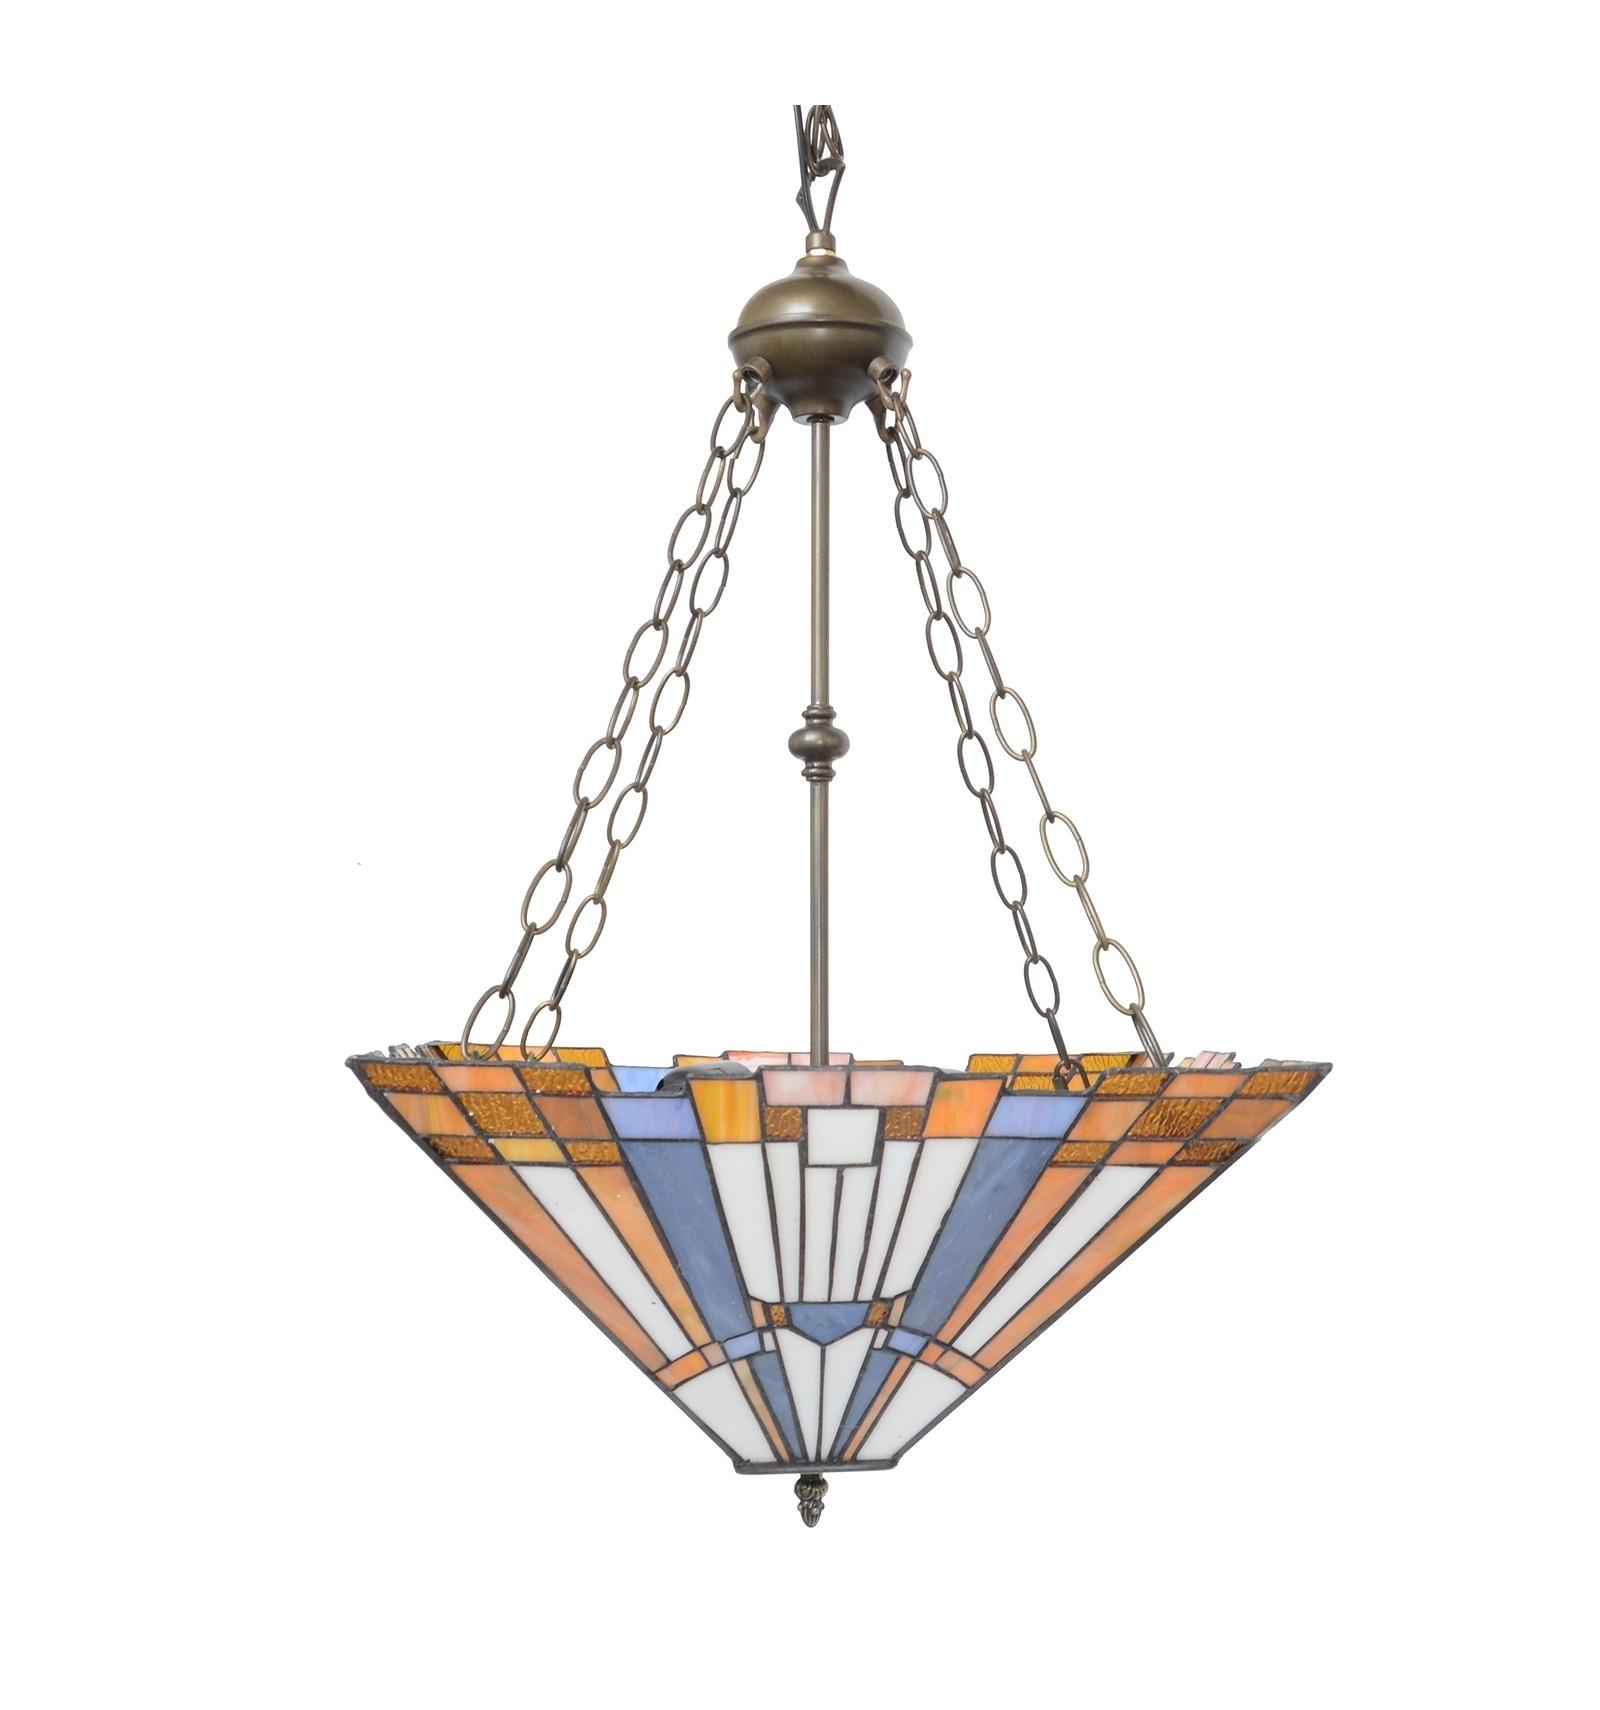 Inverted Tiffany Ceiling Light Art Deco New York Art Deco Lighting